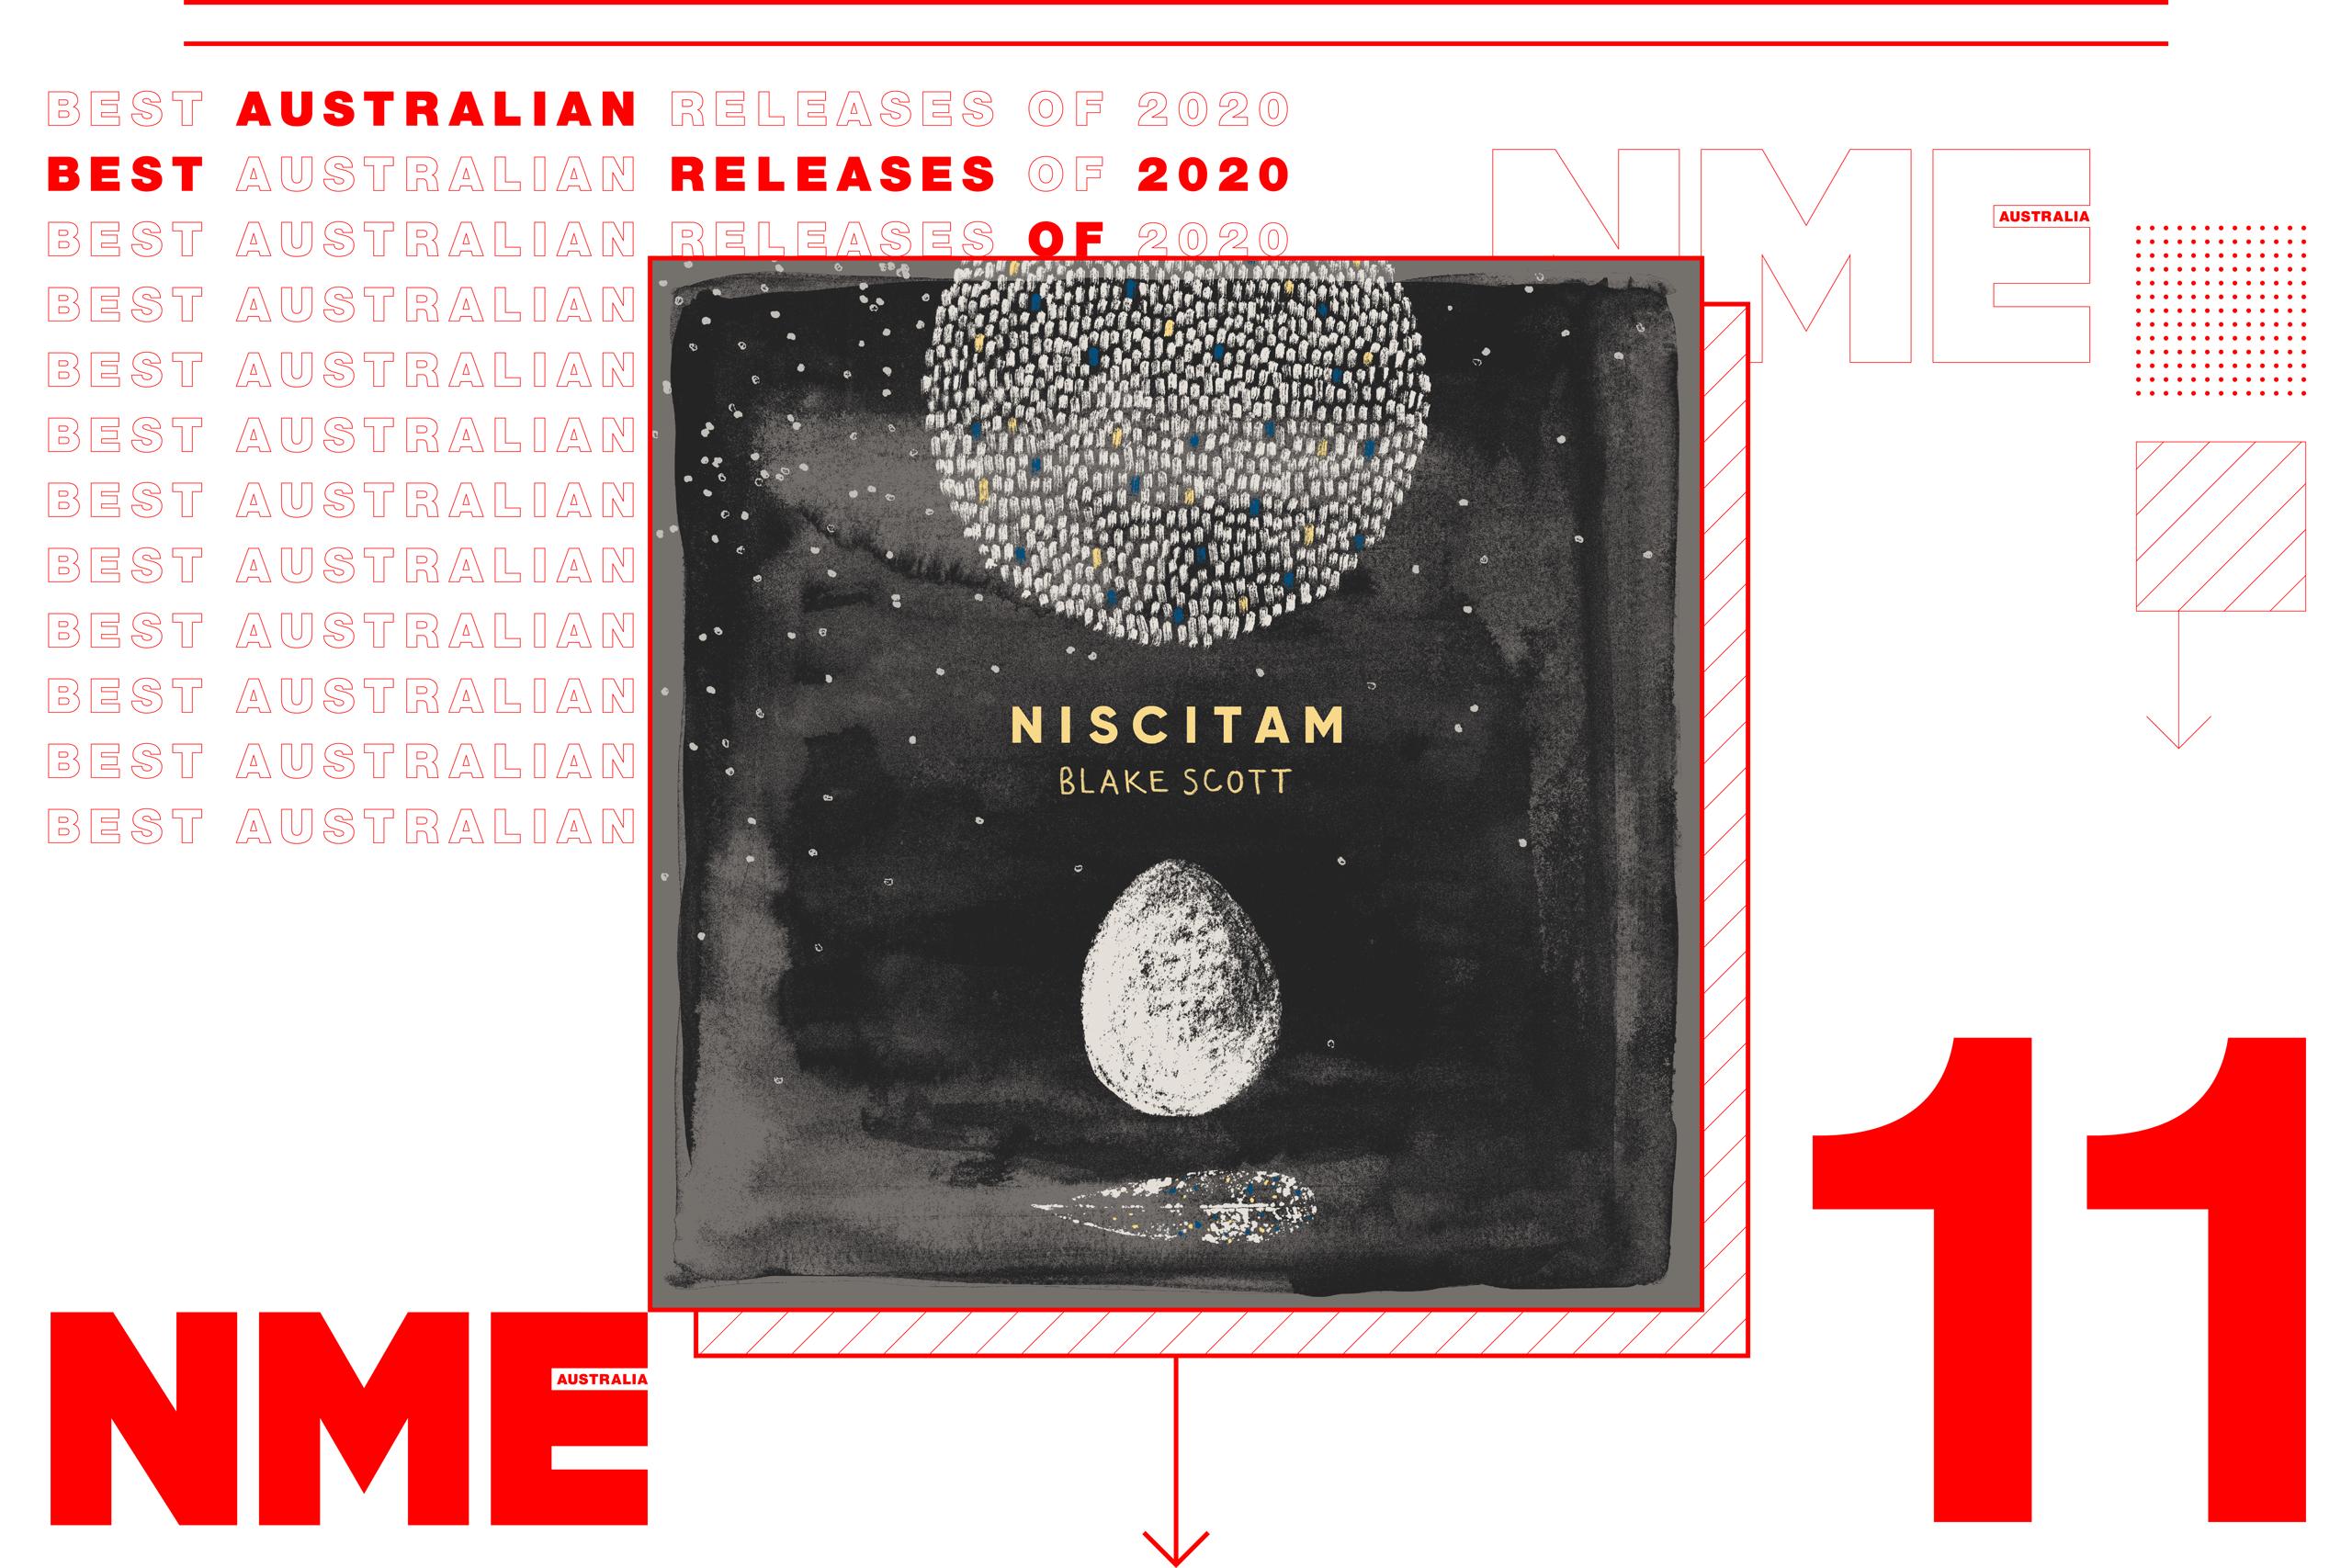 NME Australian Album Release 11